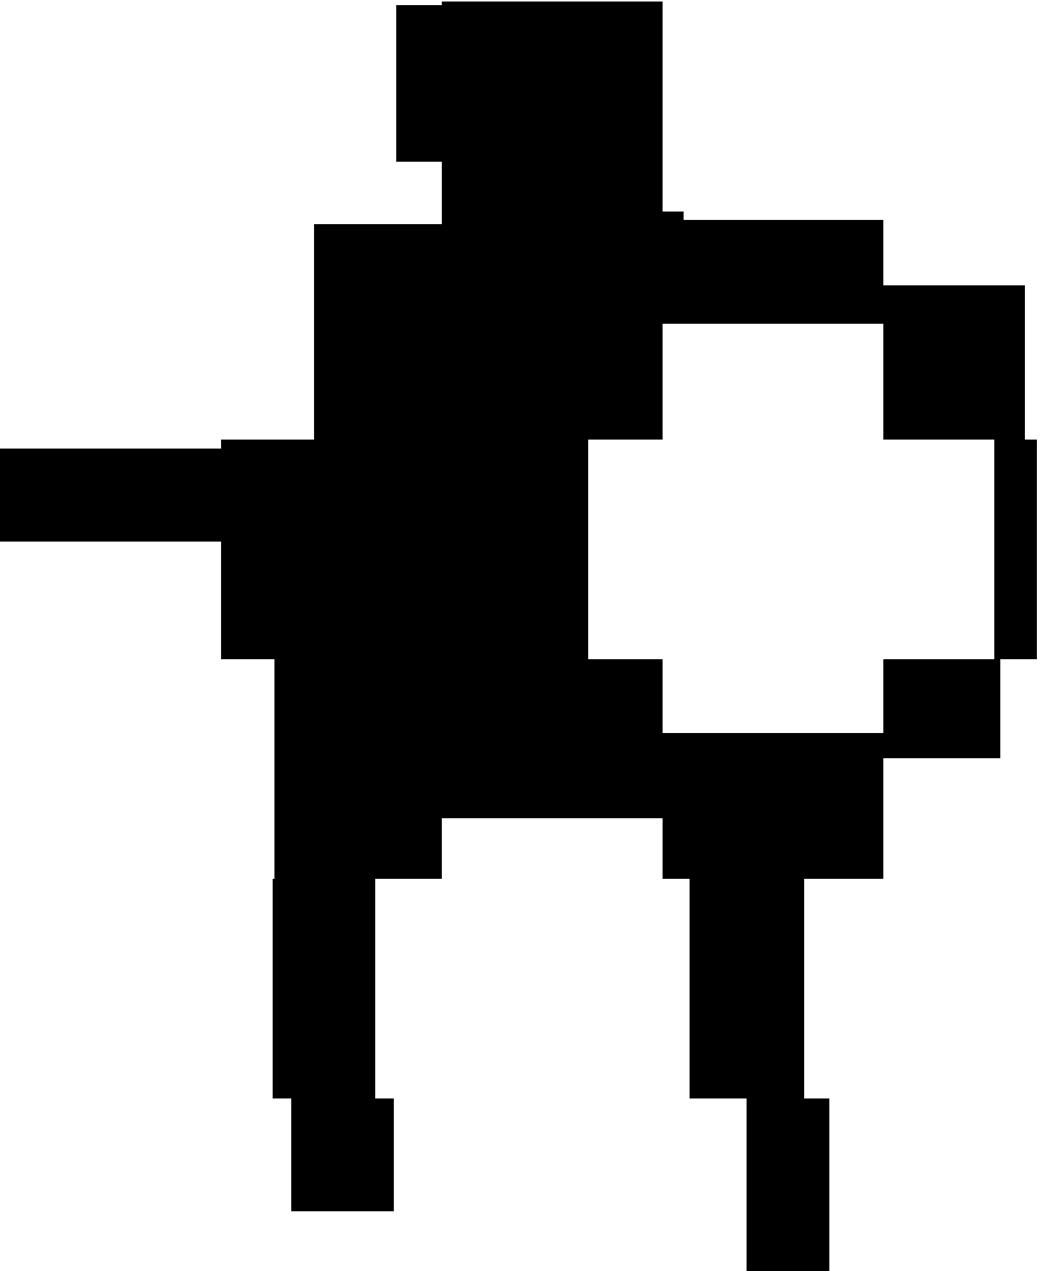 1045x1271 Human Skeleton Outline